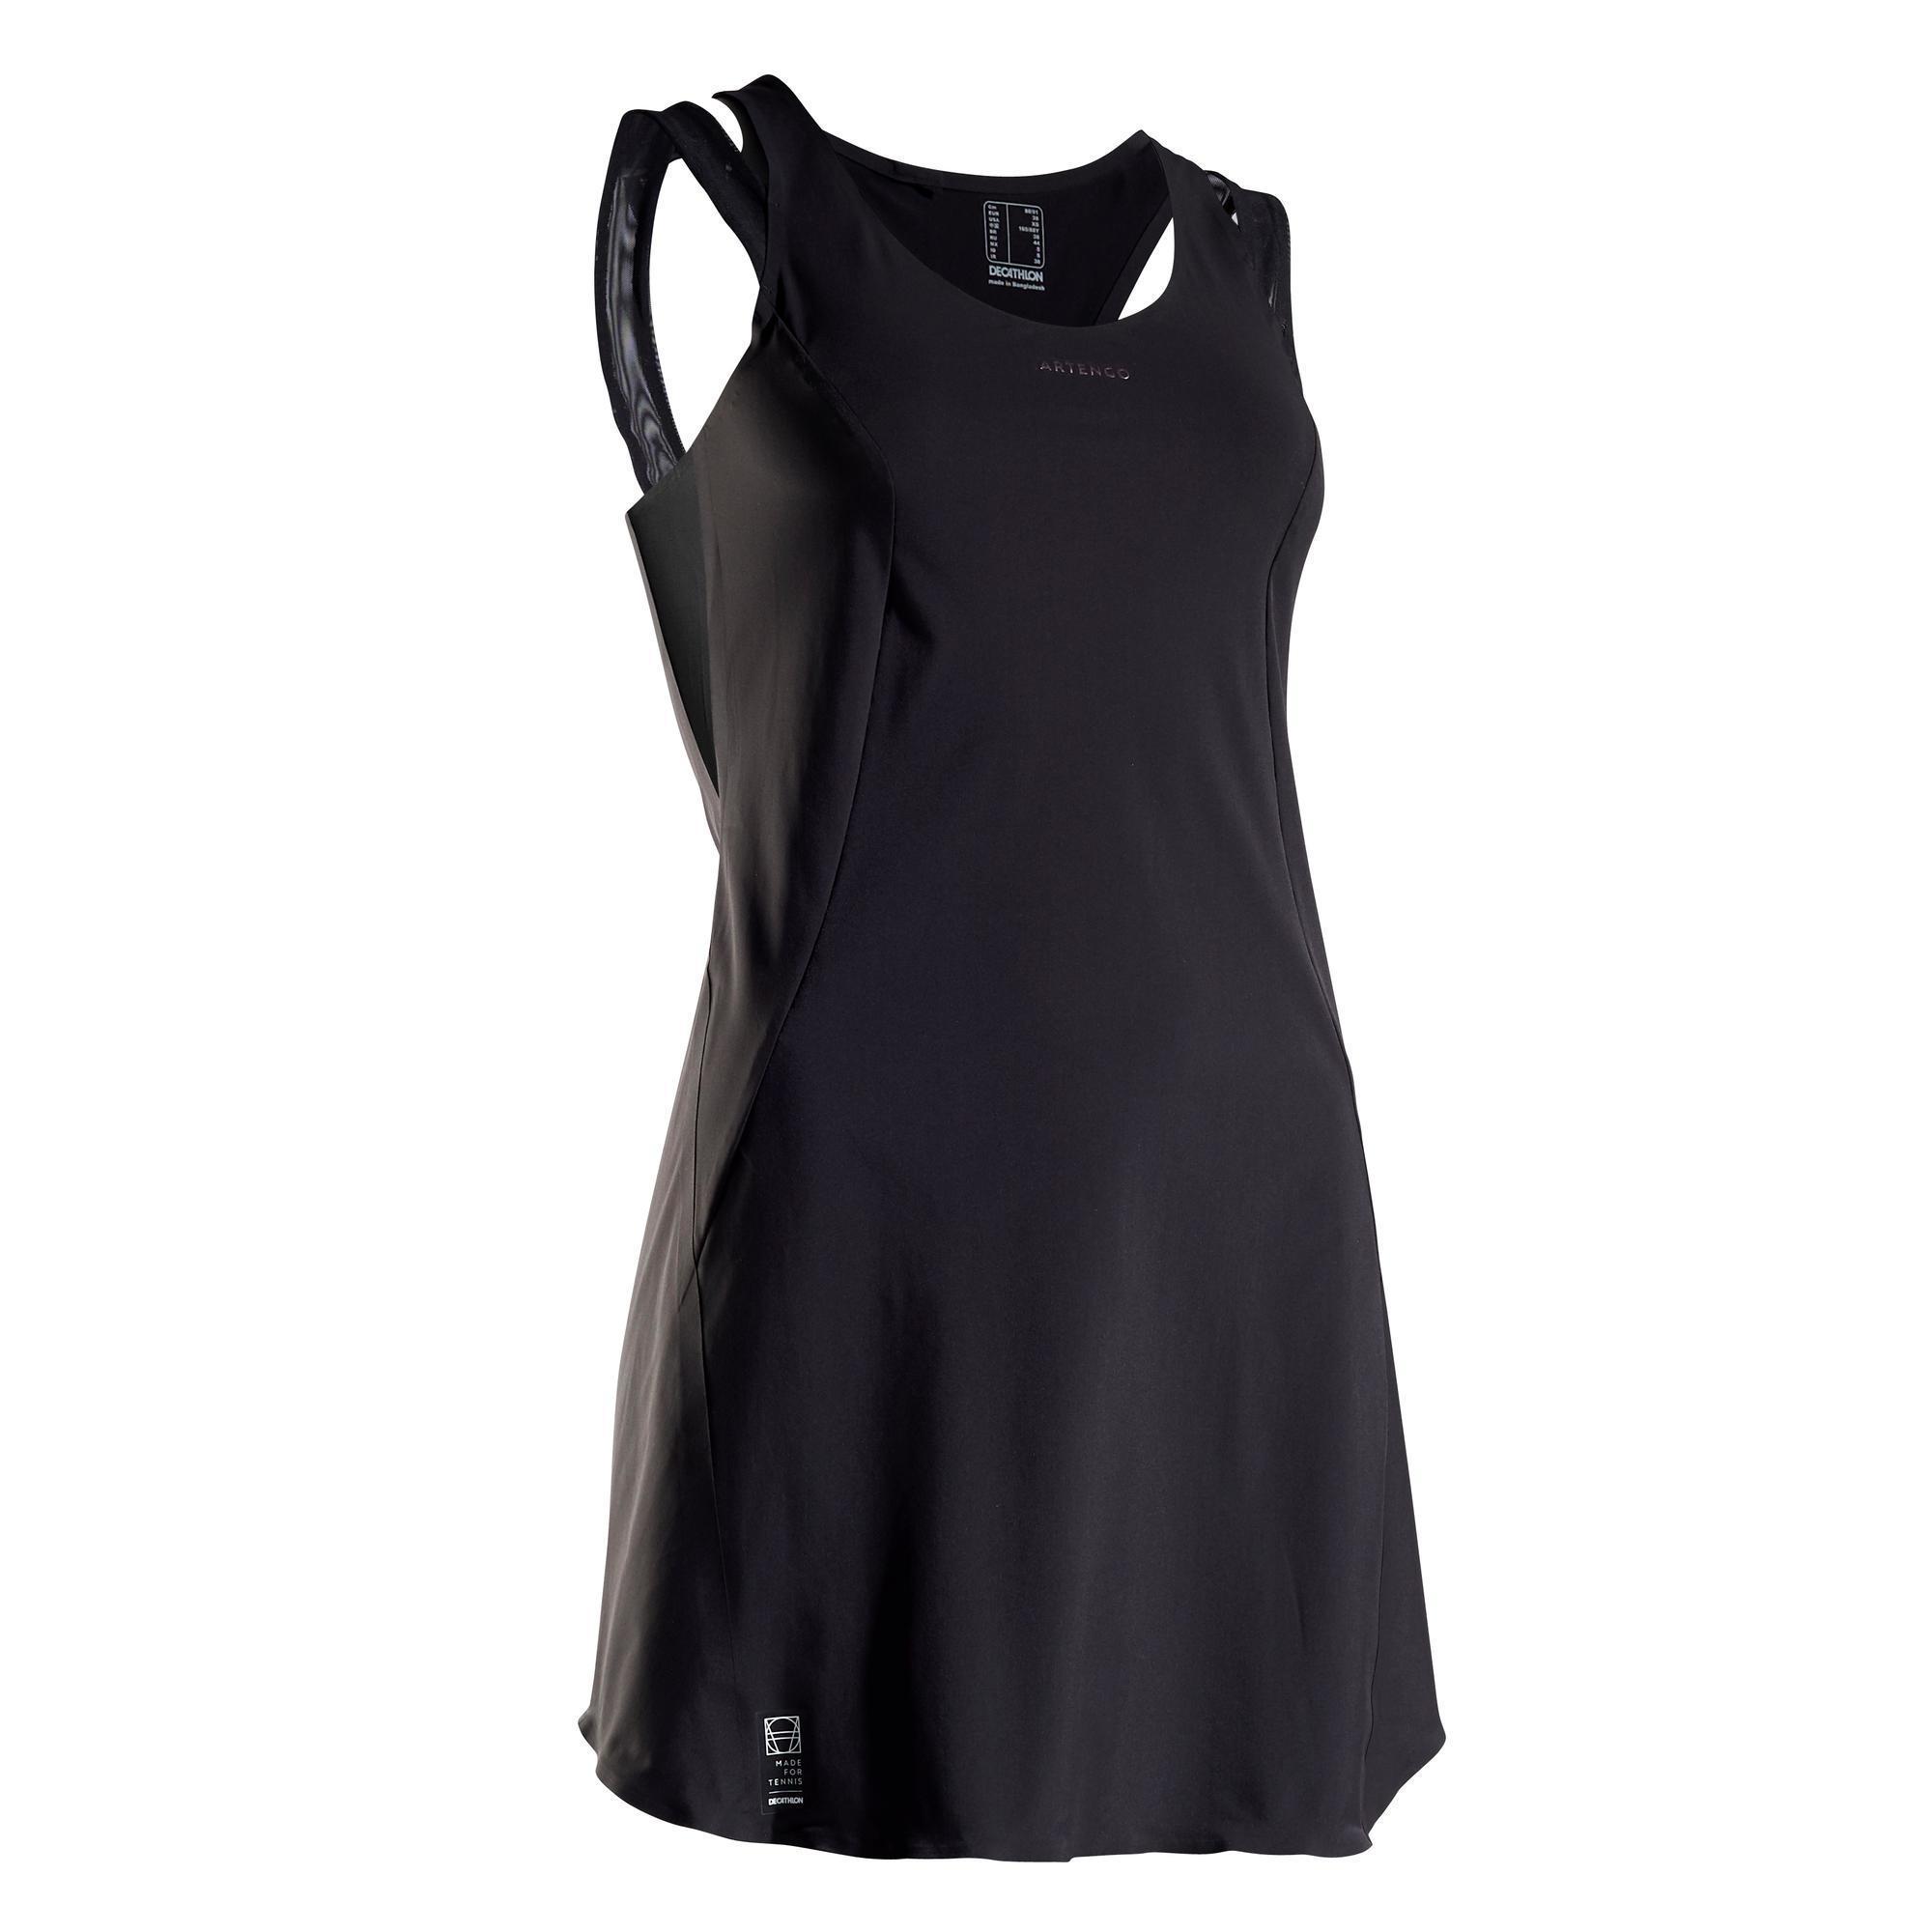 Tenniskleid DR Light 990 schwarz | Sportbekleidung > Sportröcke > Tennisröcke | Artengo